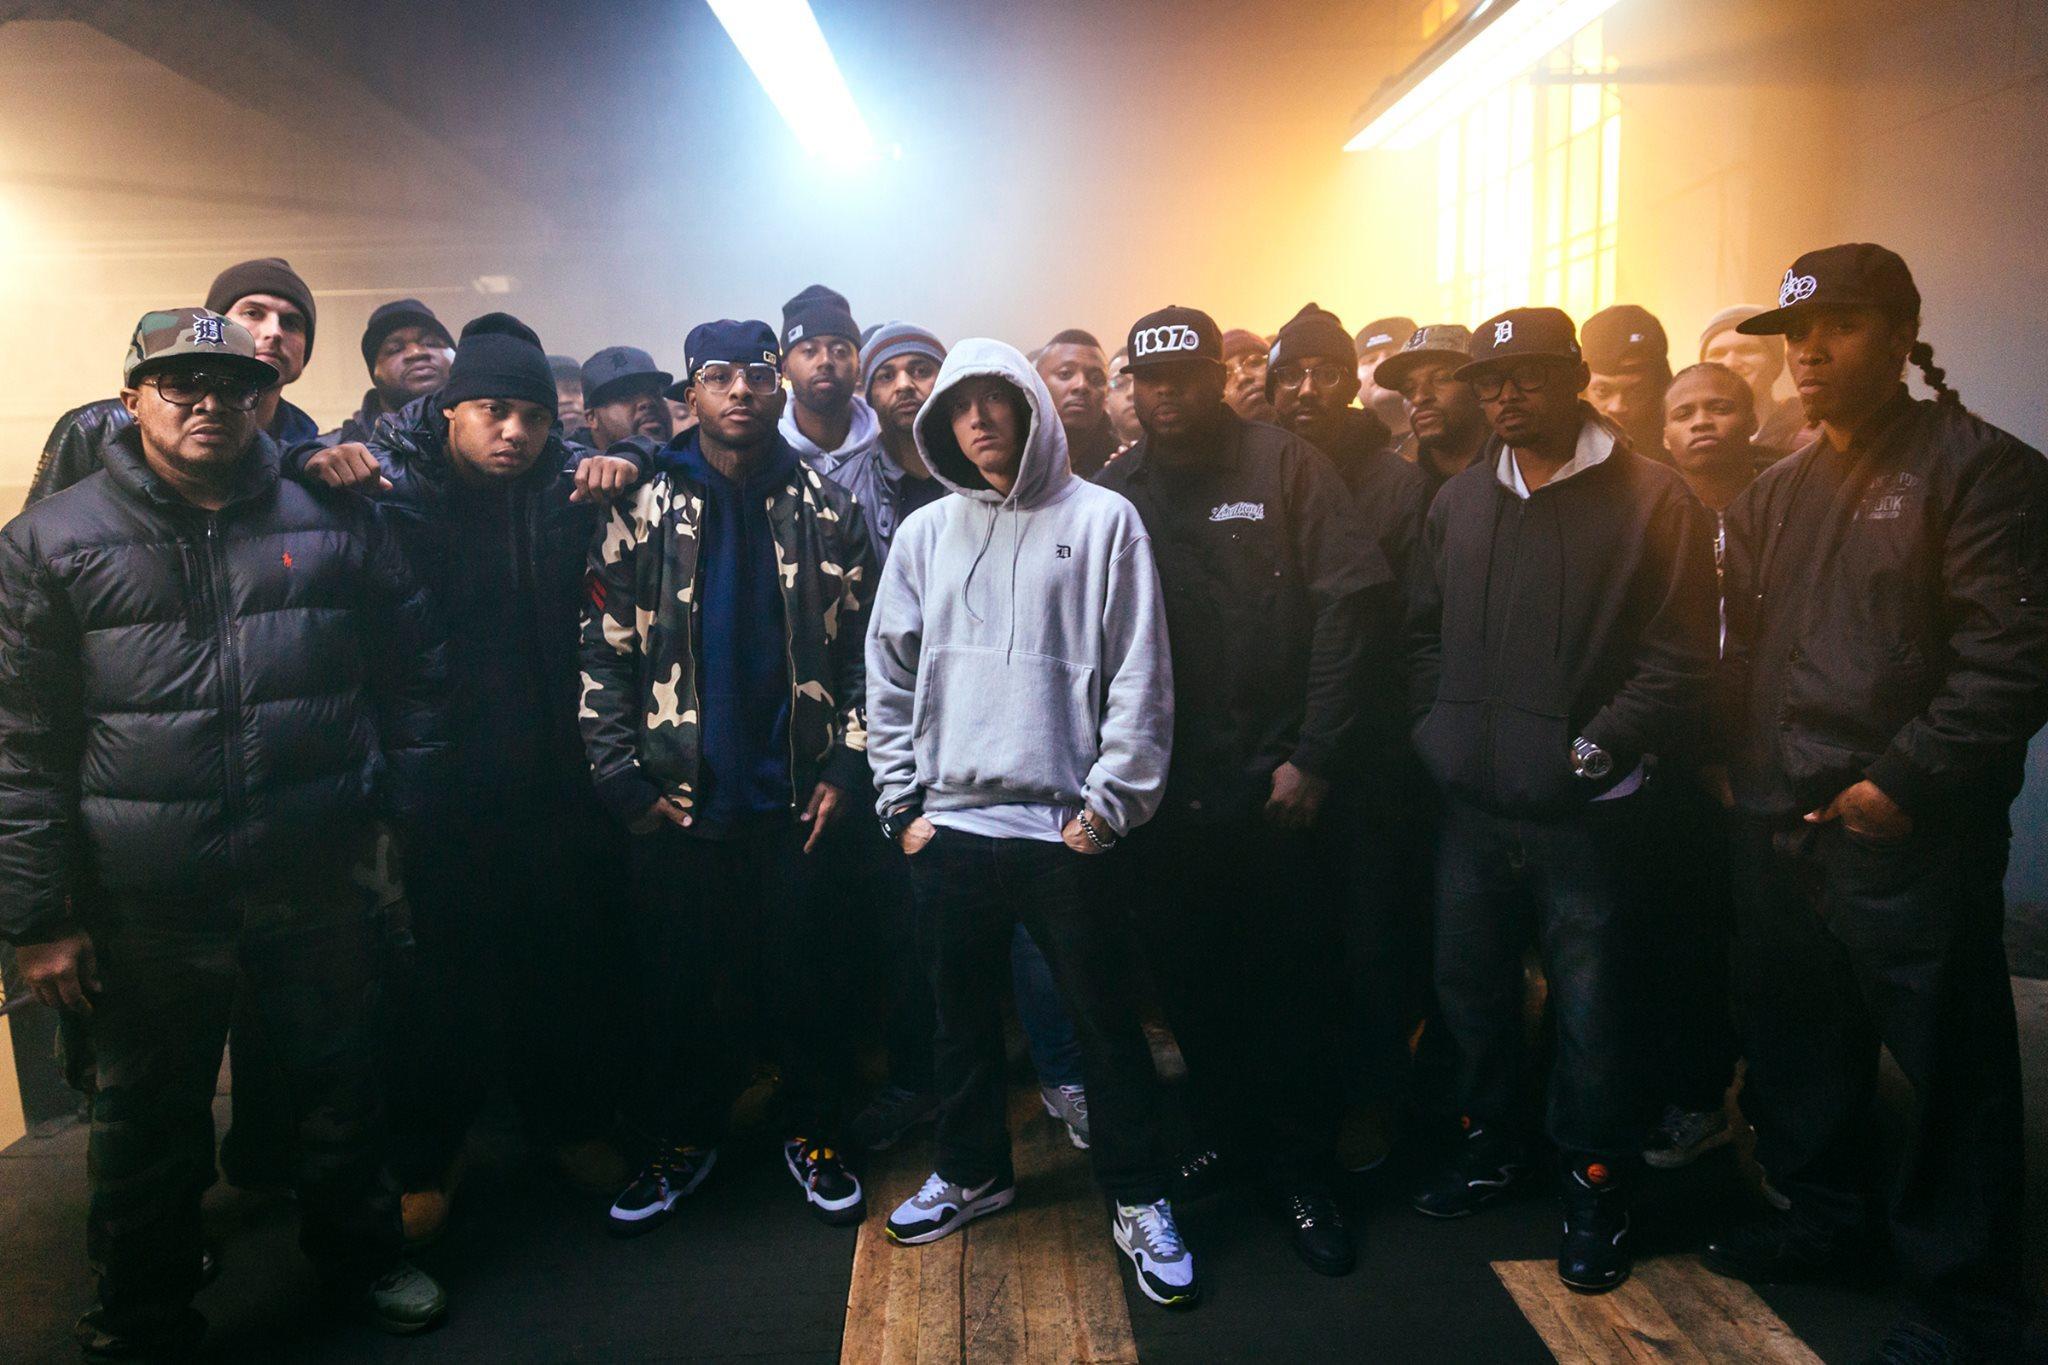 Hdq-gangsta rap 2016 hd